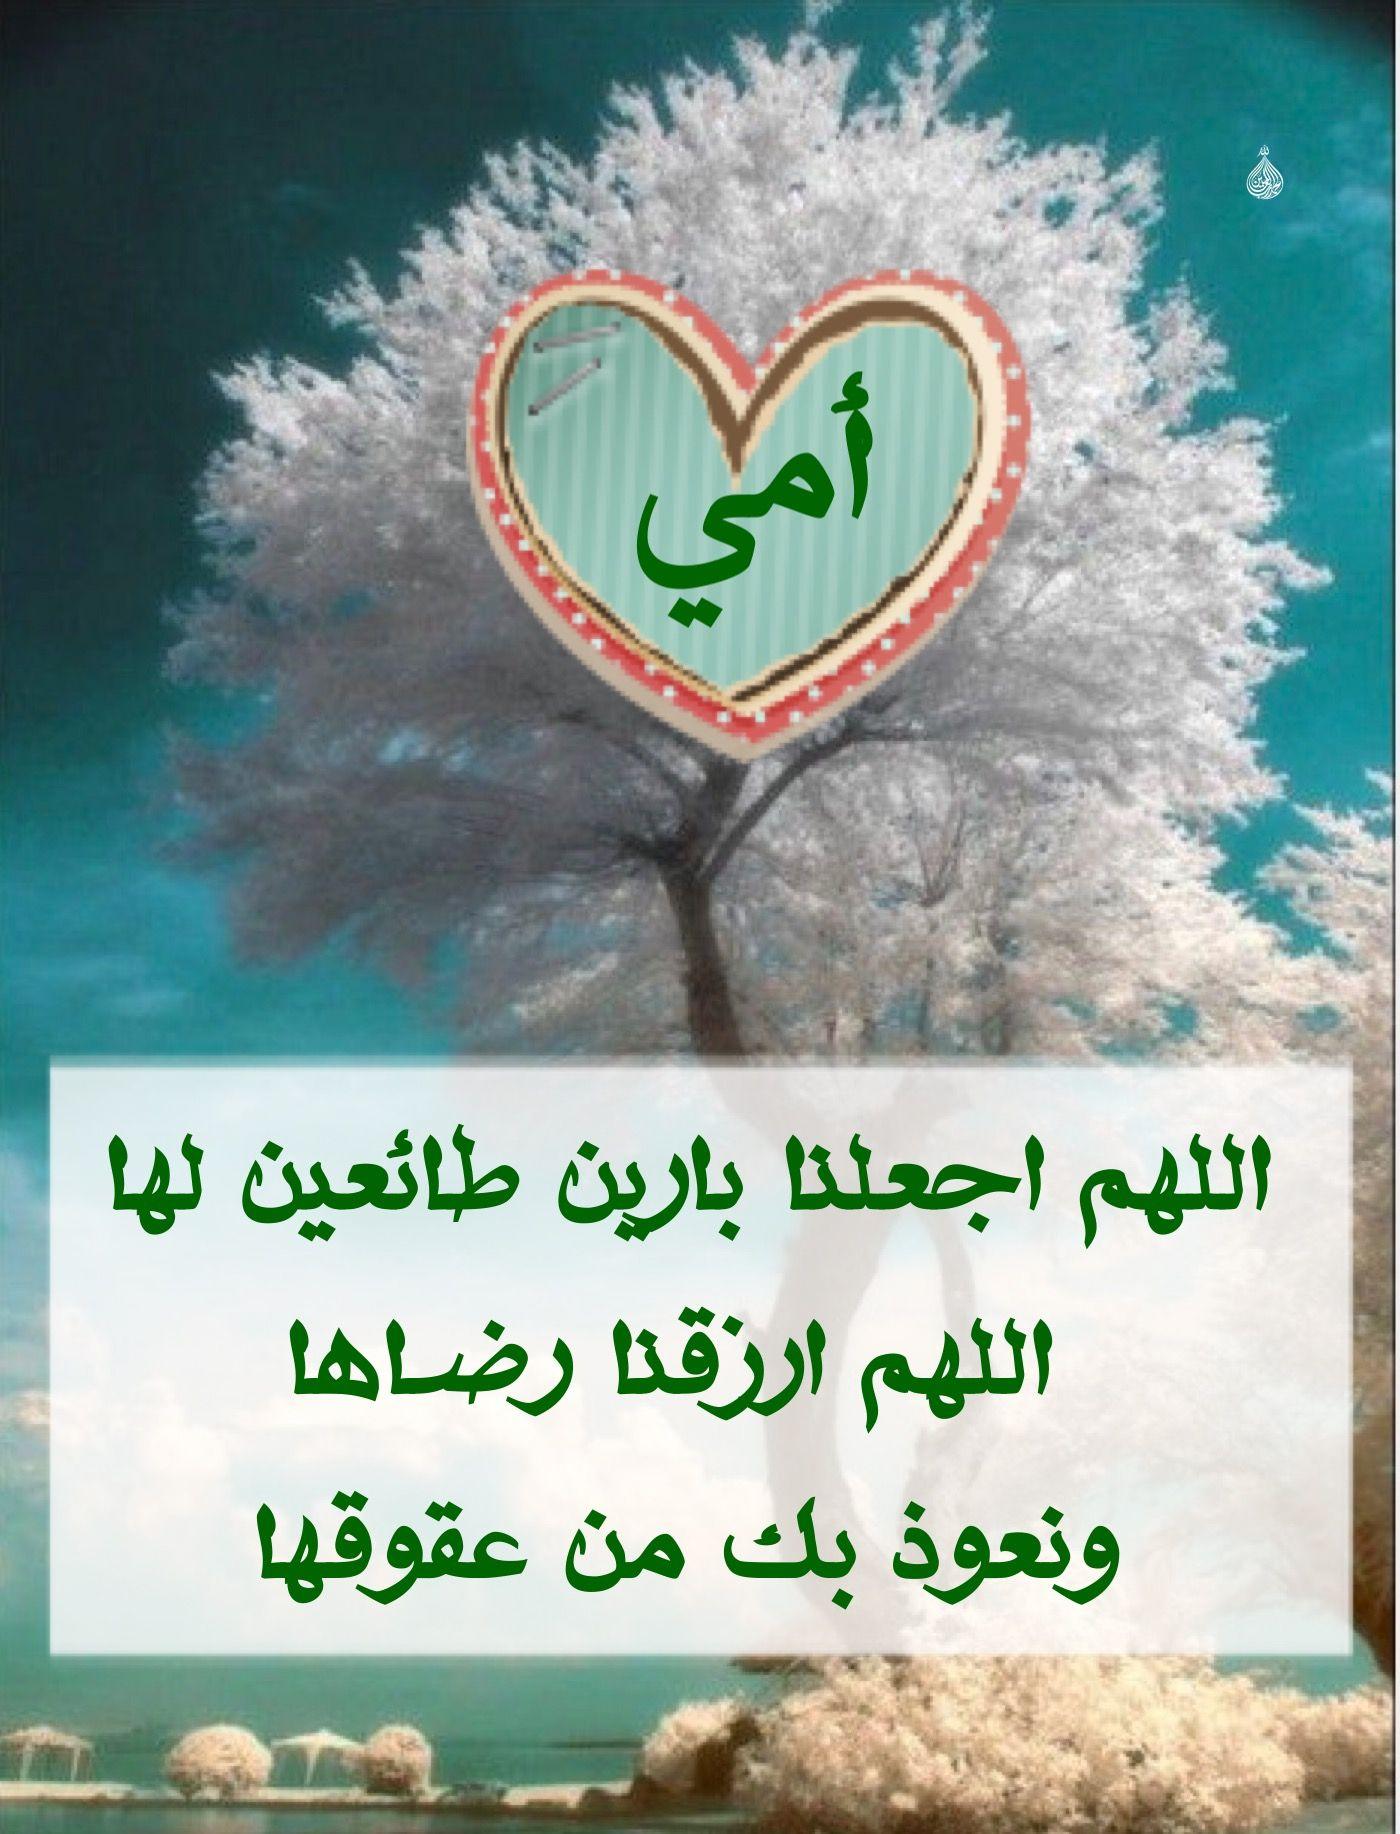 Pin By أدعية إسلامية دعاء أأذكار الج On أذكار دعاء Enamel Pins Layla